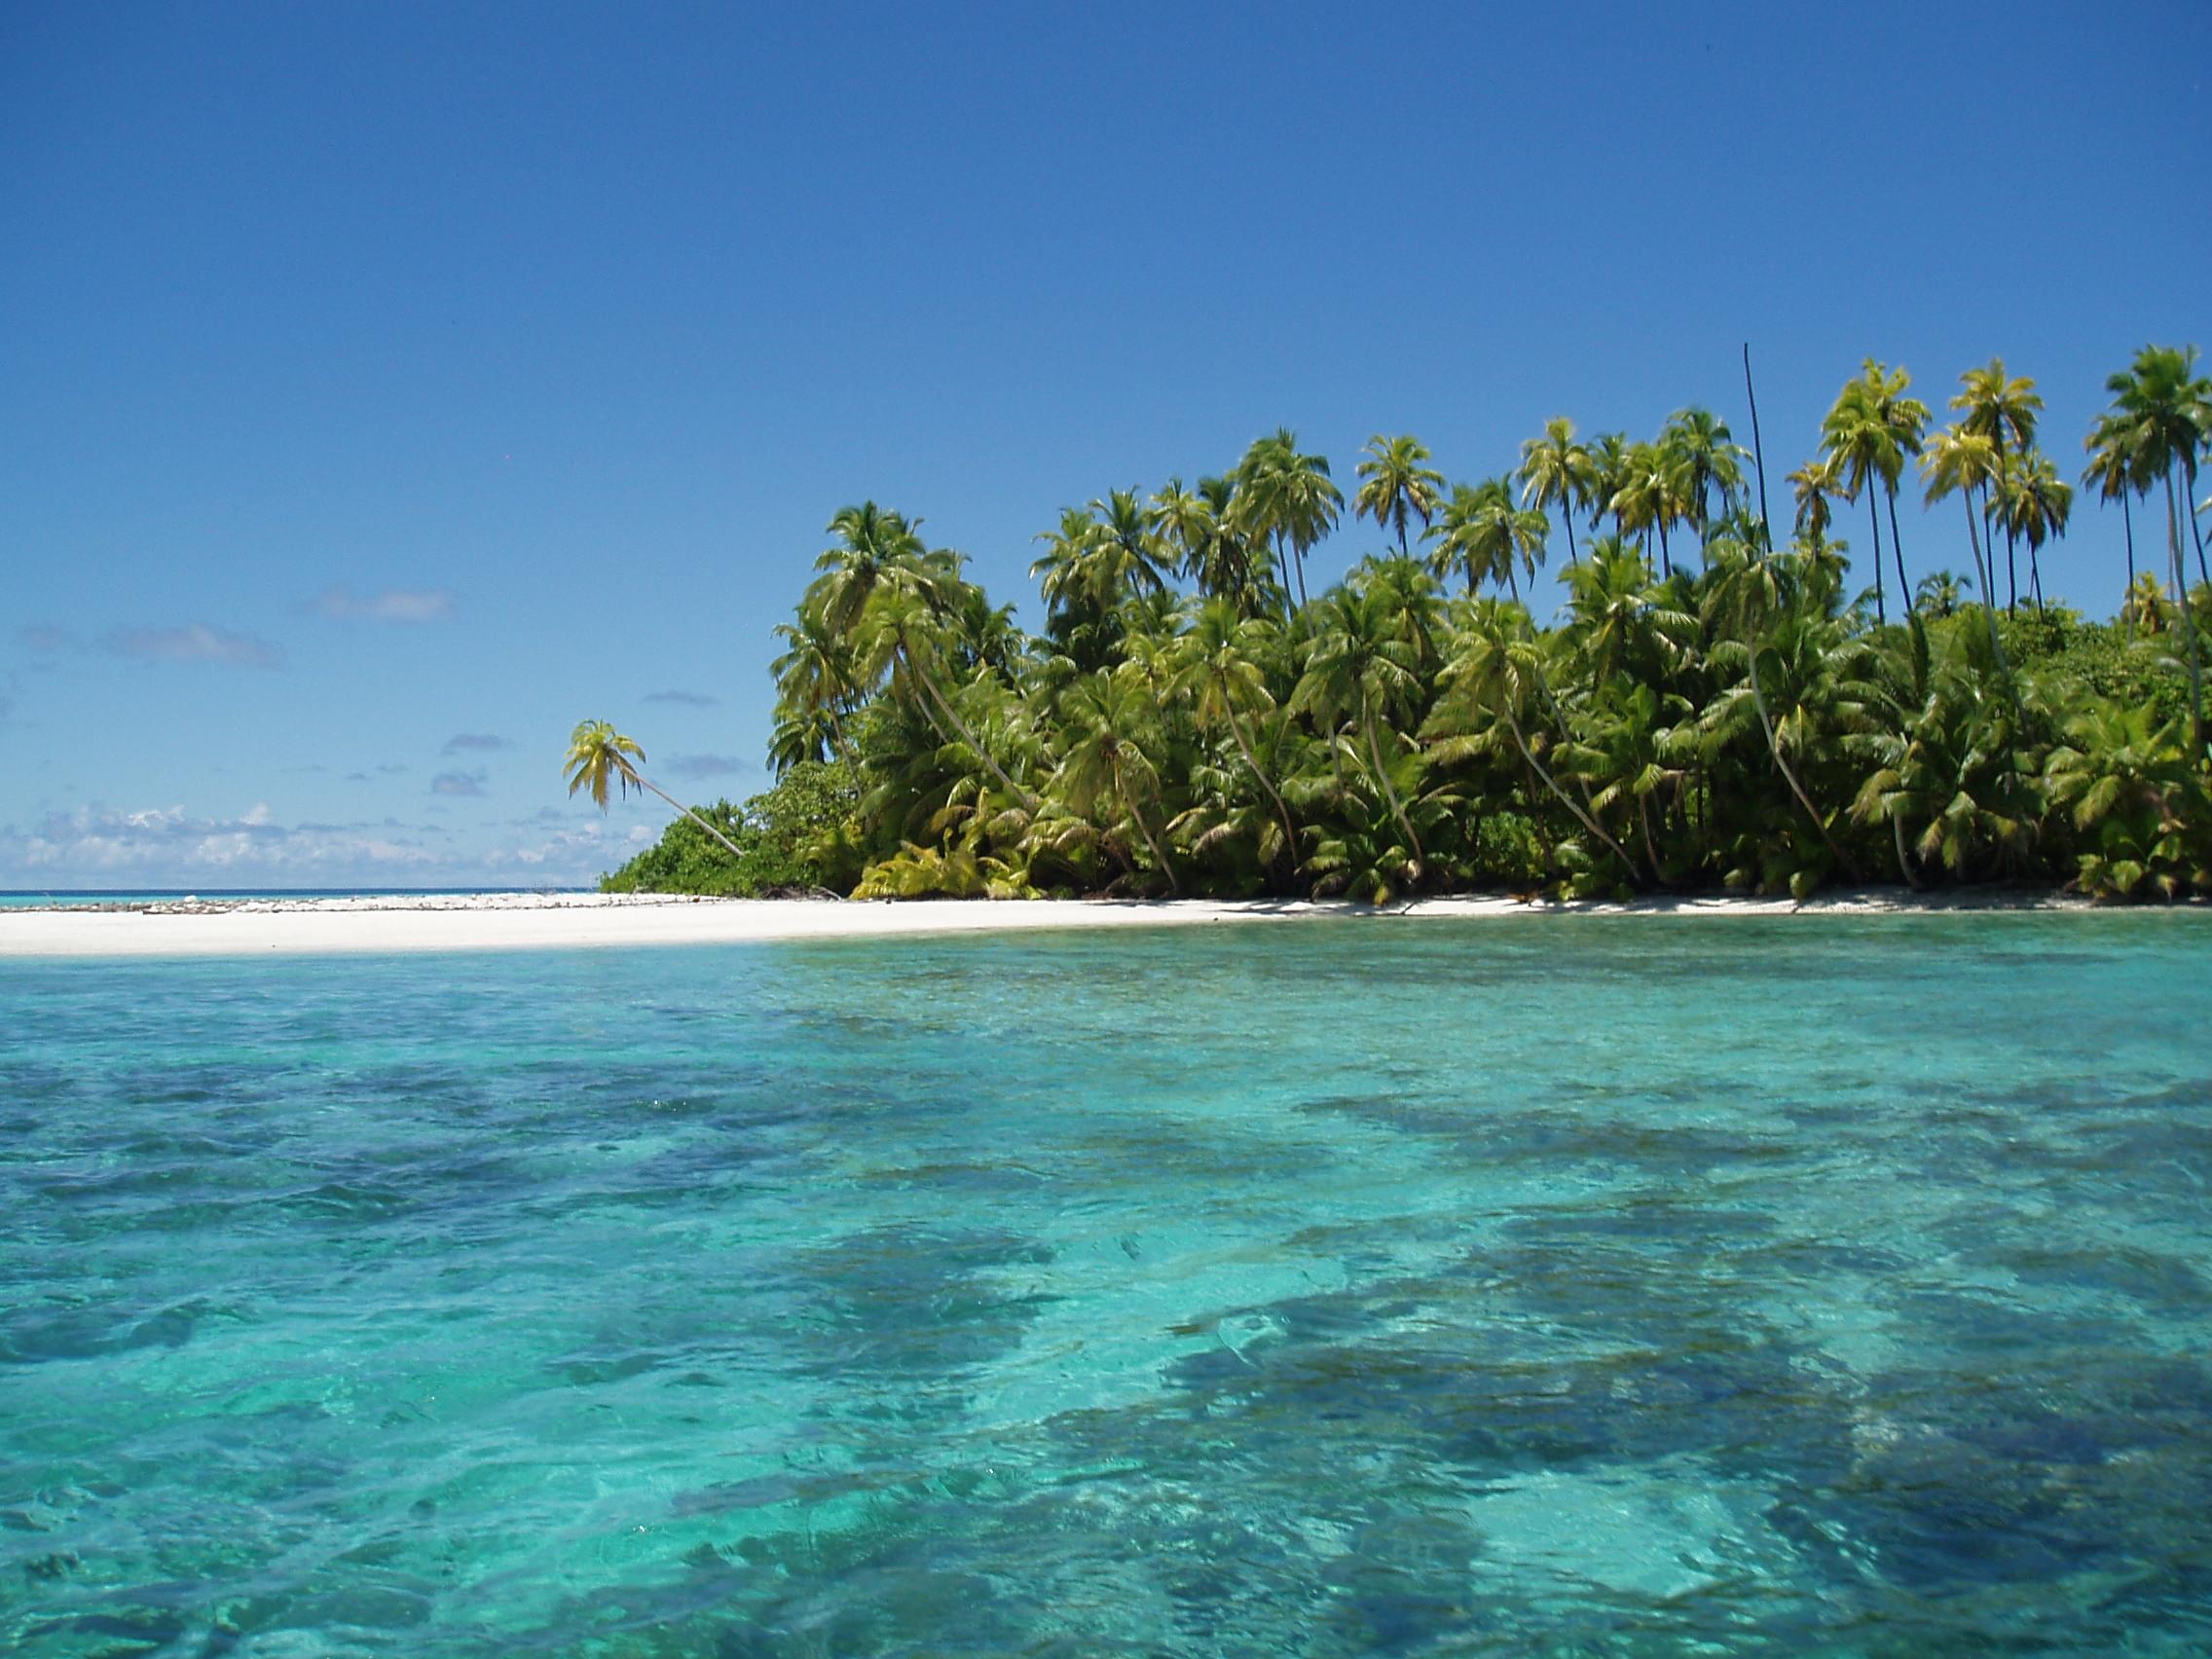 La CIJ examinera en septembre le litige sur l'avenir des îles Chagos